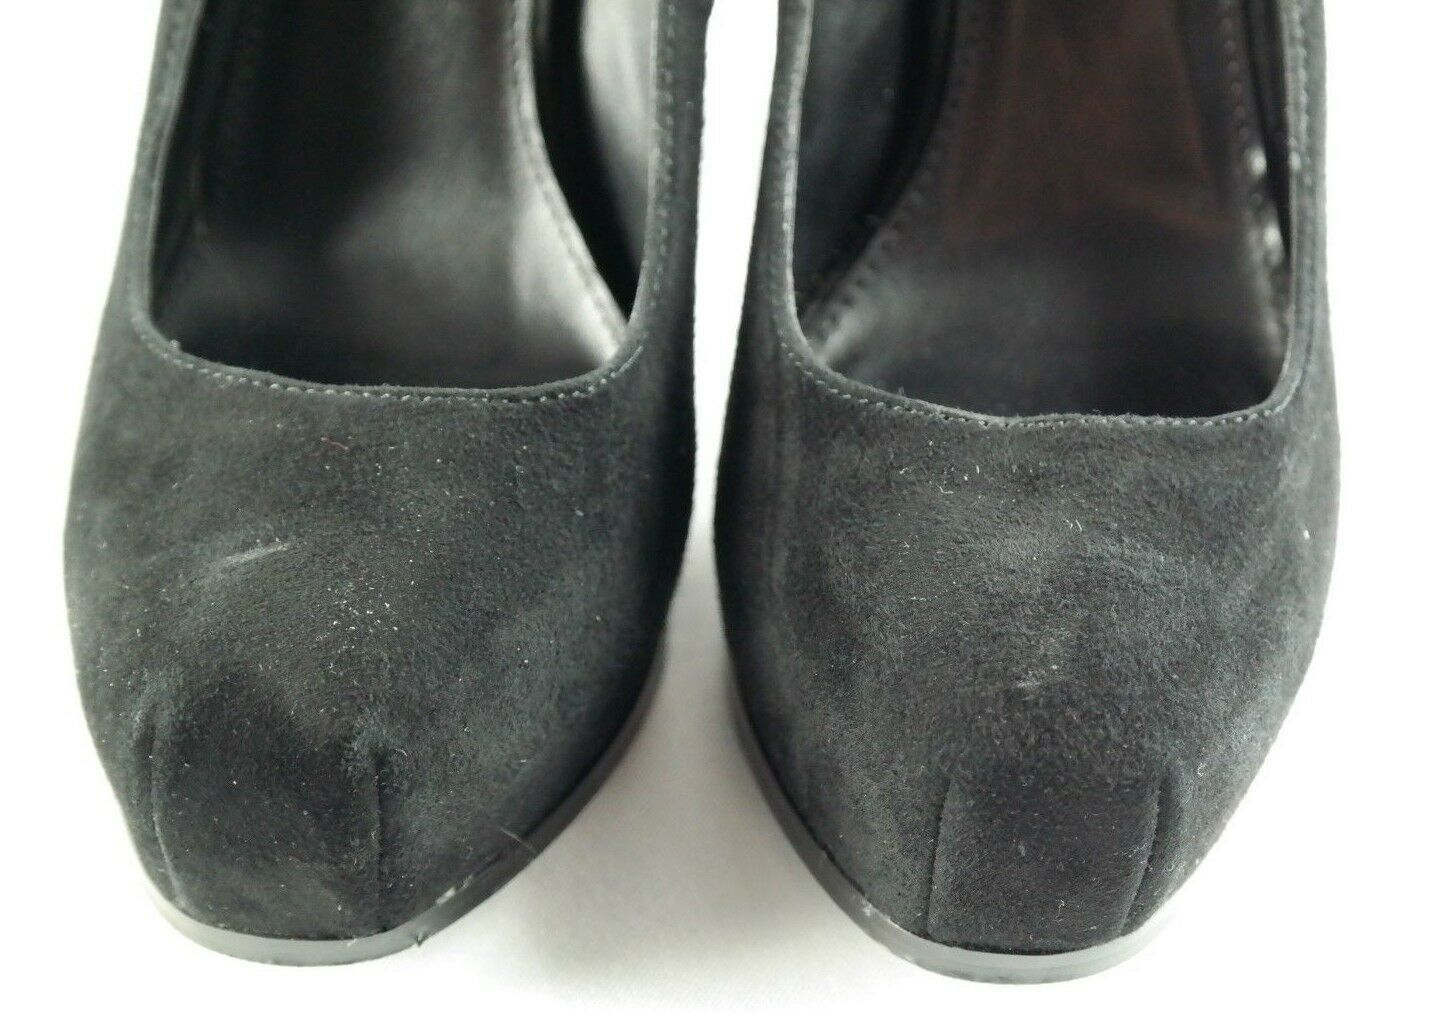 Steve Madden Sarrina Platform Pumps Womens Sz 7.5 Black Suede High Heel Shoes image 11